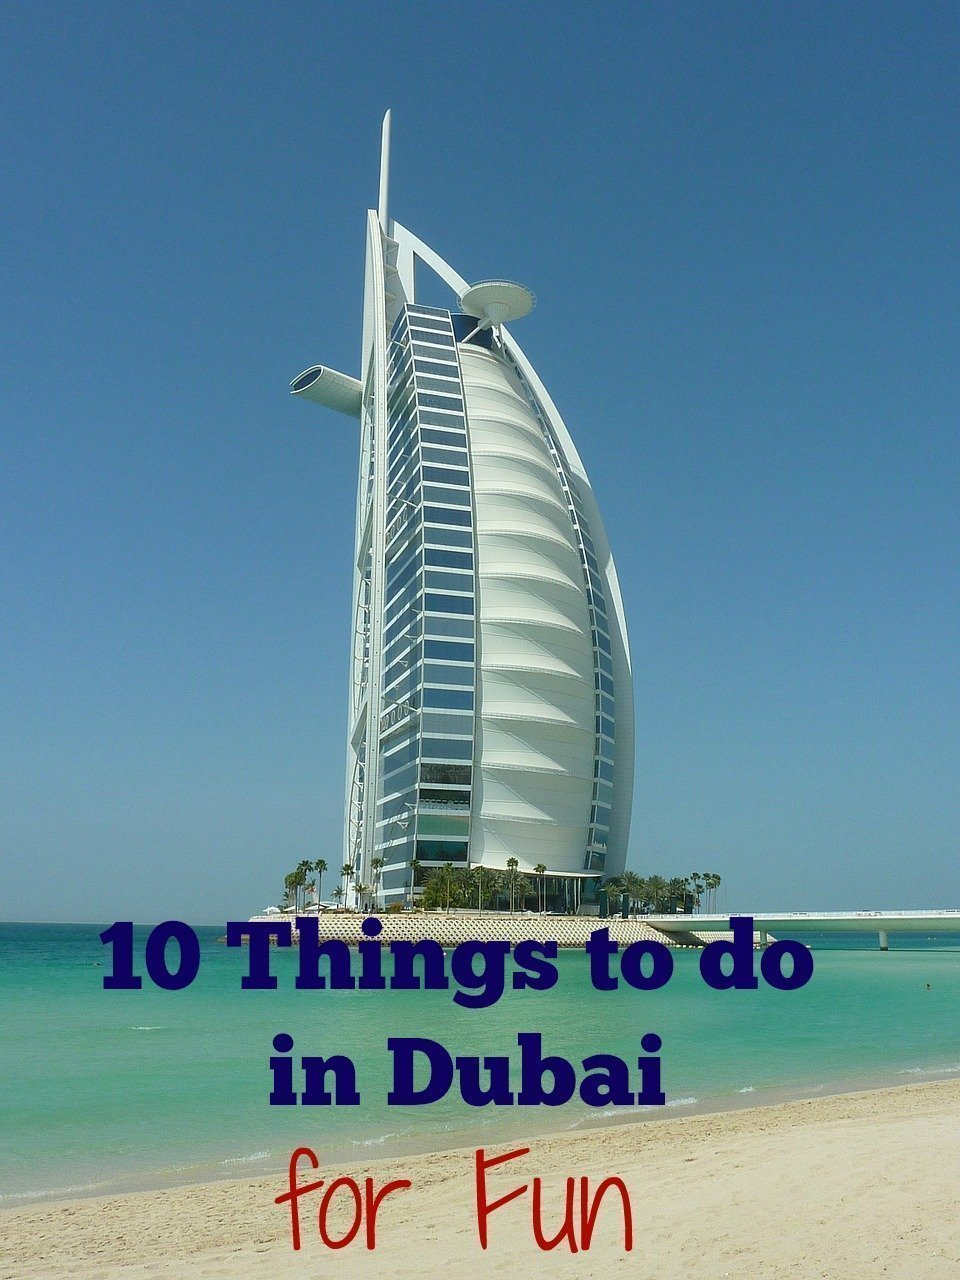 10 Things to do in Dubai for Fun